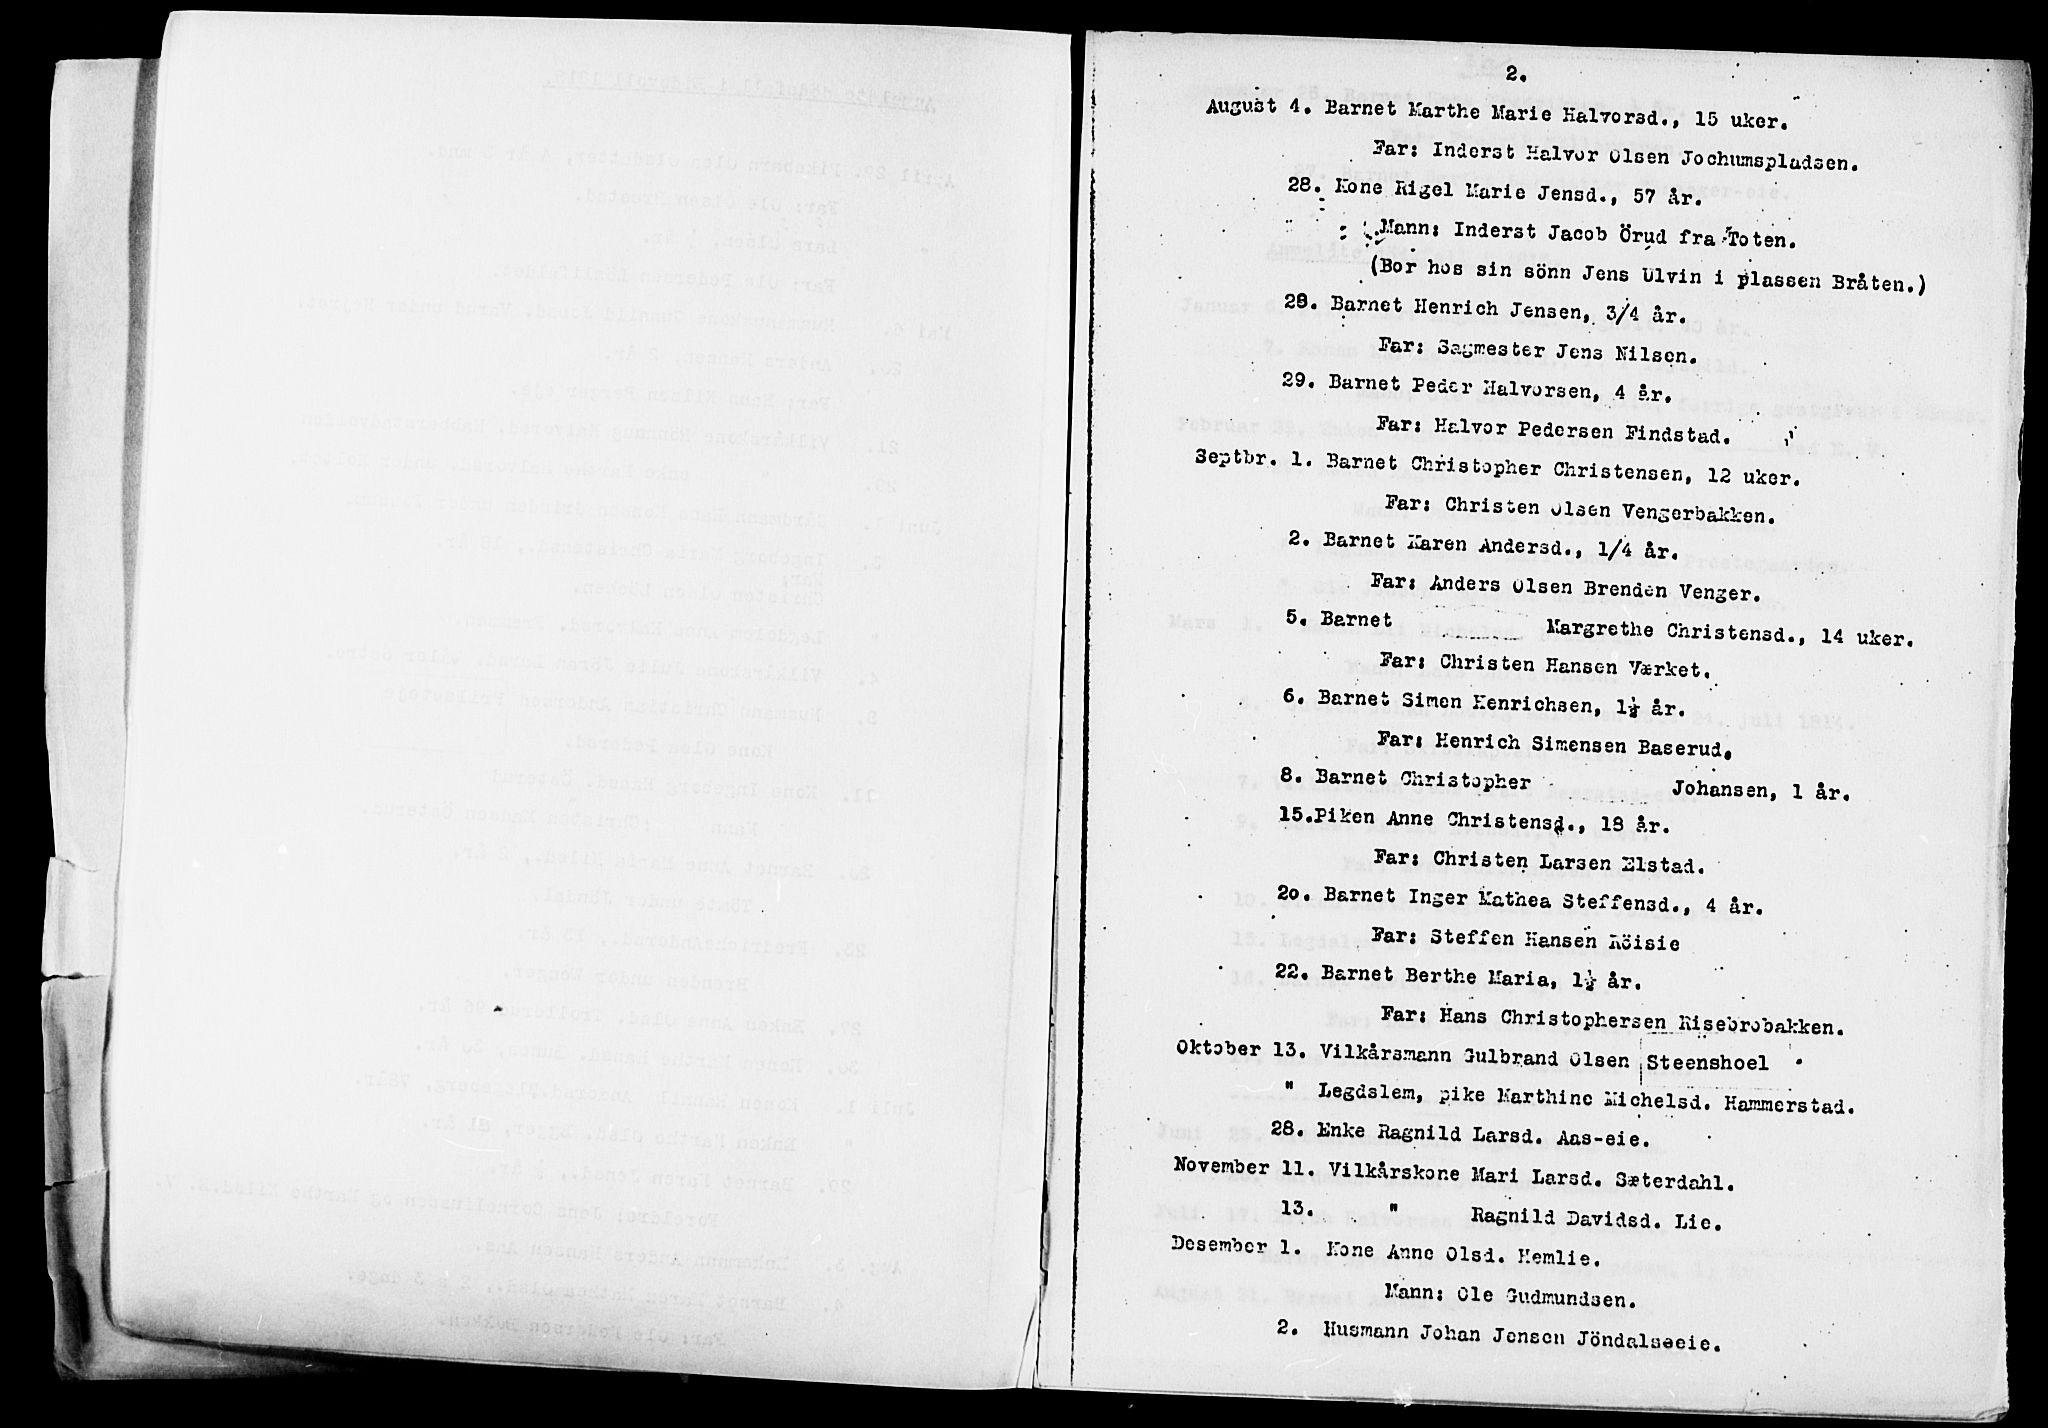 SAO, Eidsvoll prestekontor Kirkebøker, O/Oa/L0005: Annen kirkebok nr. 5, 1815-1865, s. 2